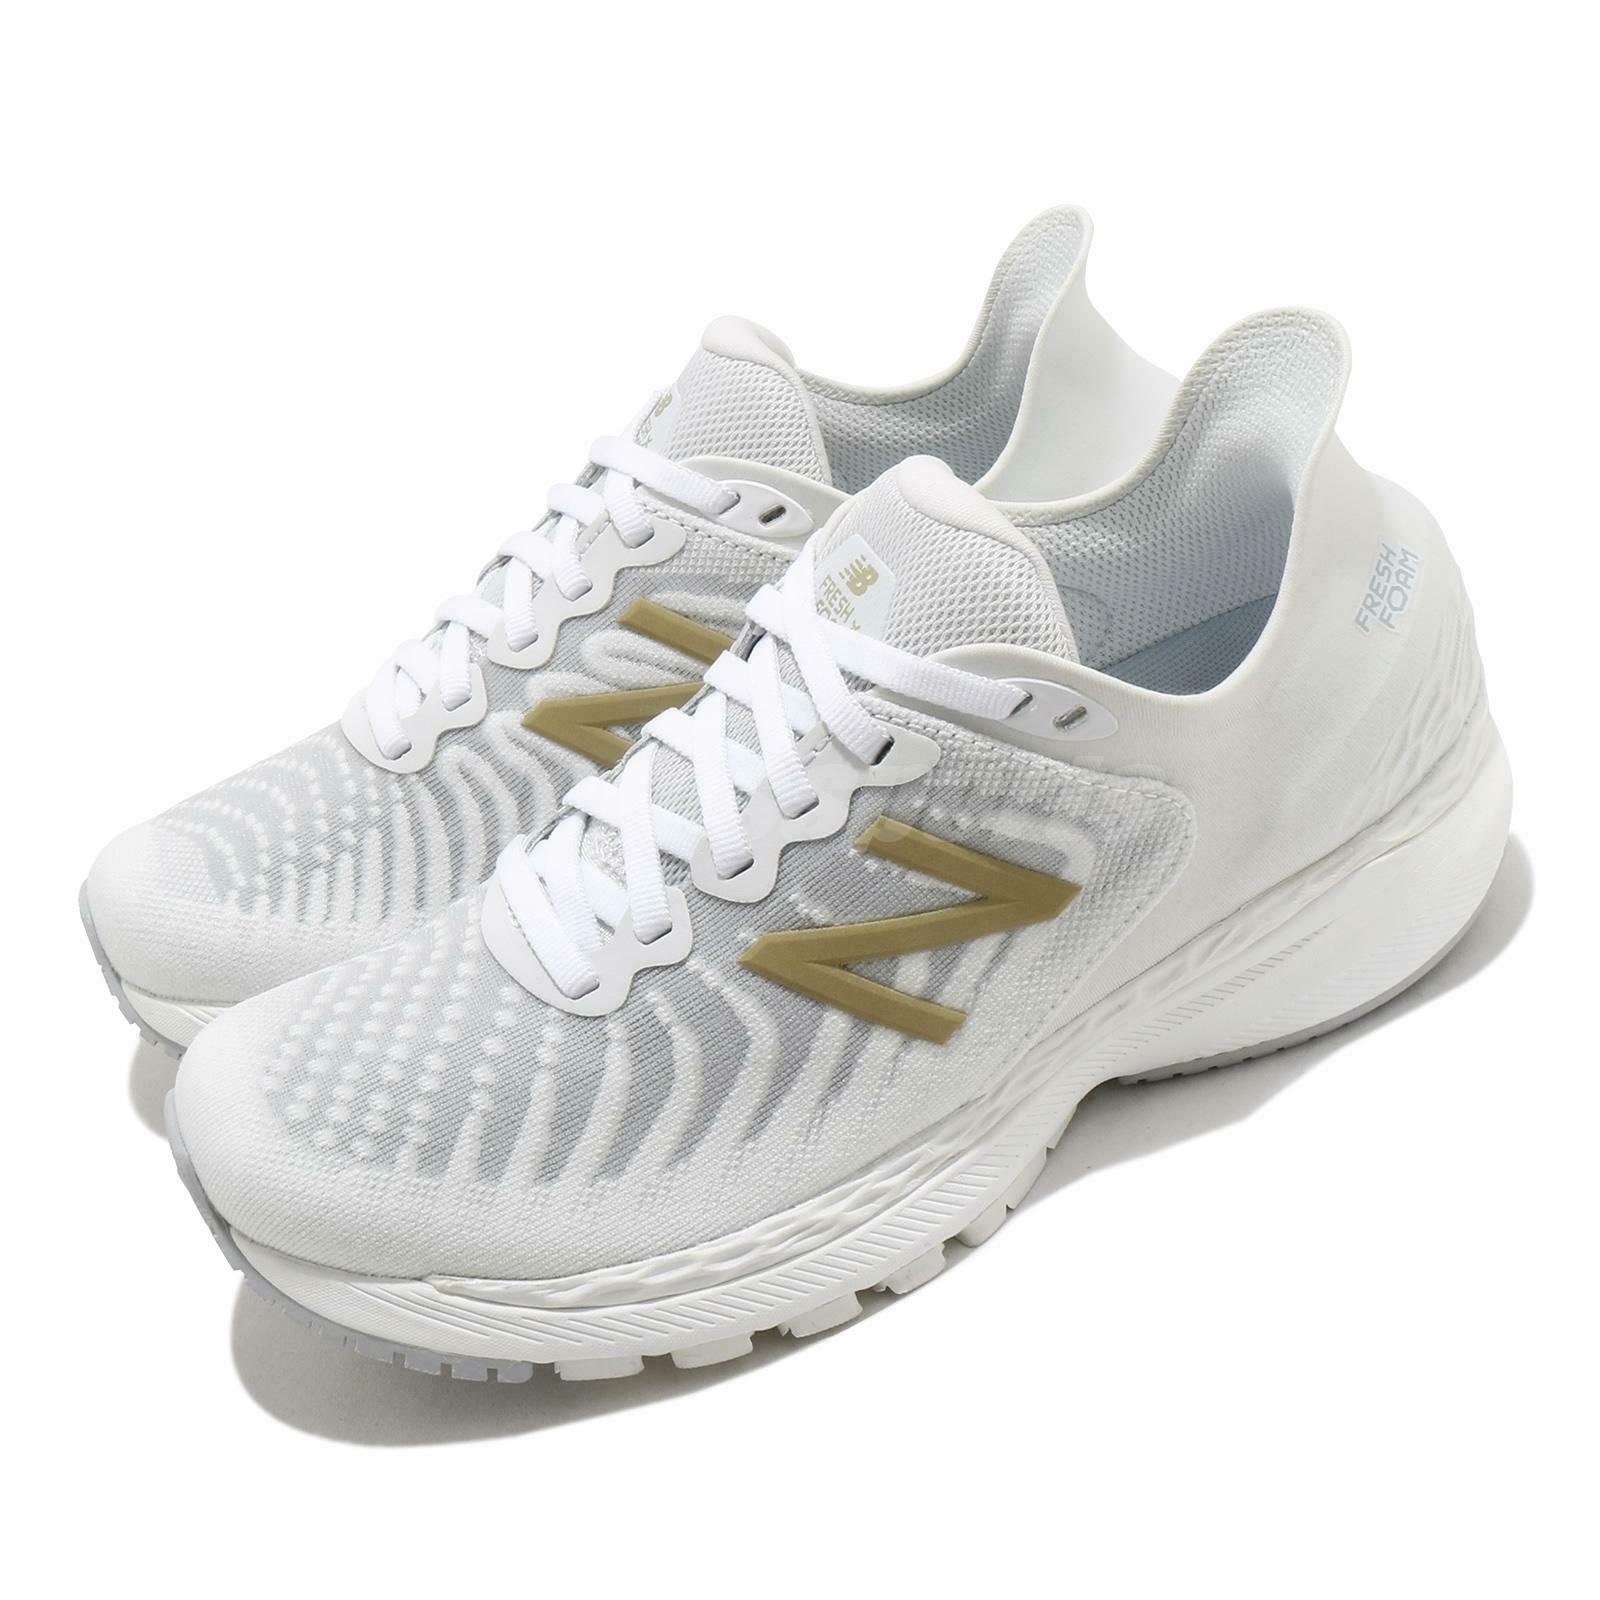 New Balance 860 v11 女 跑步鞋 白